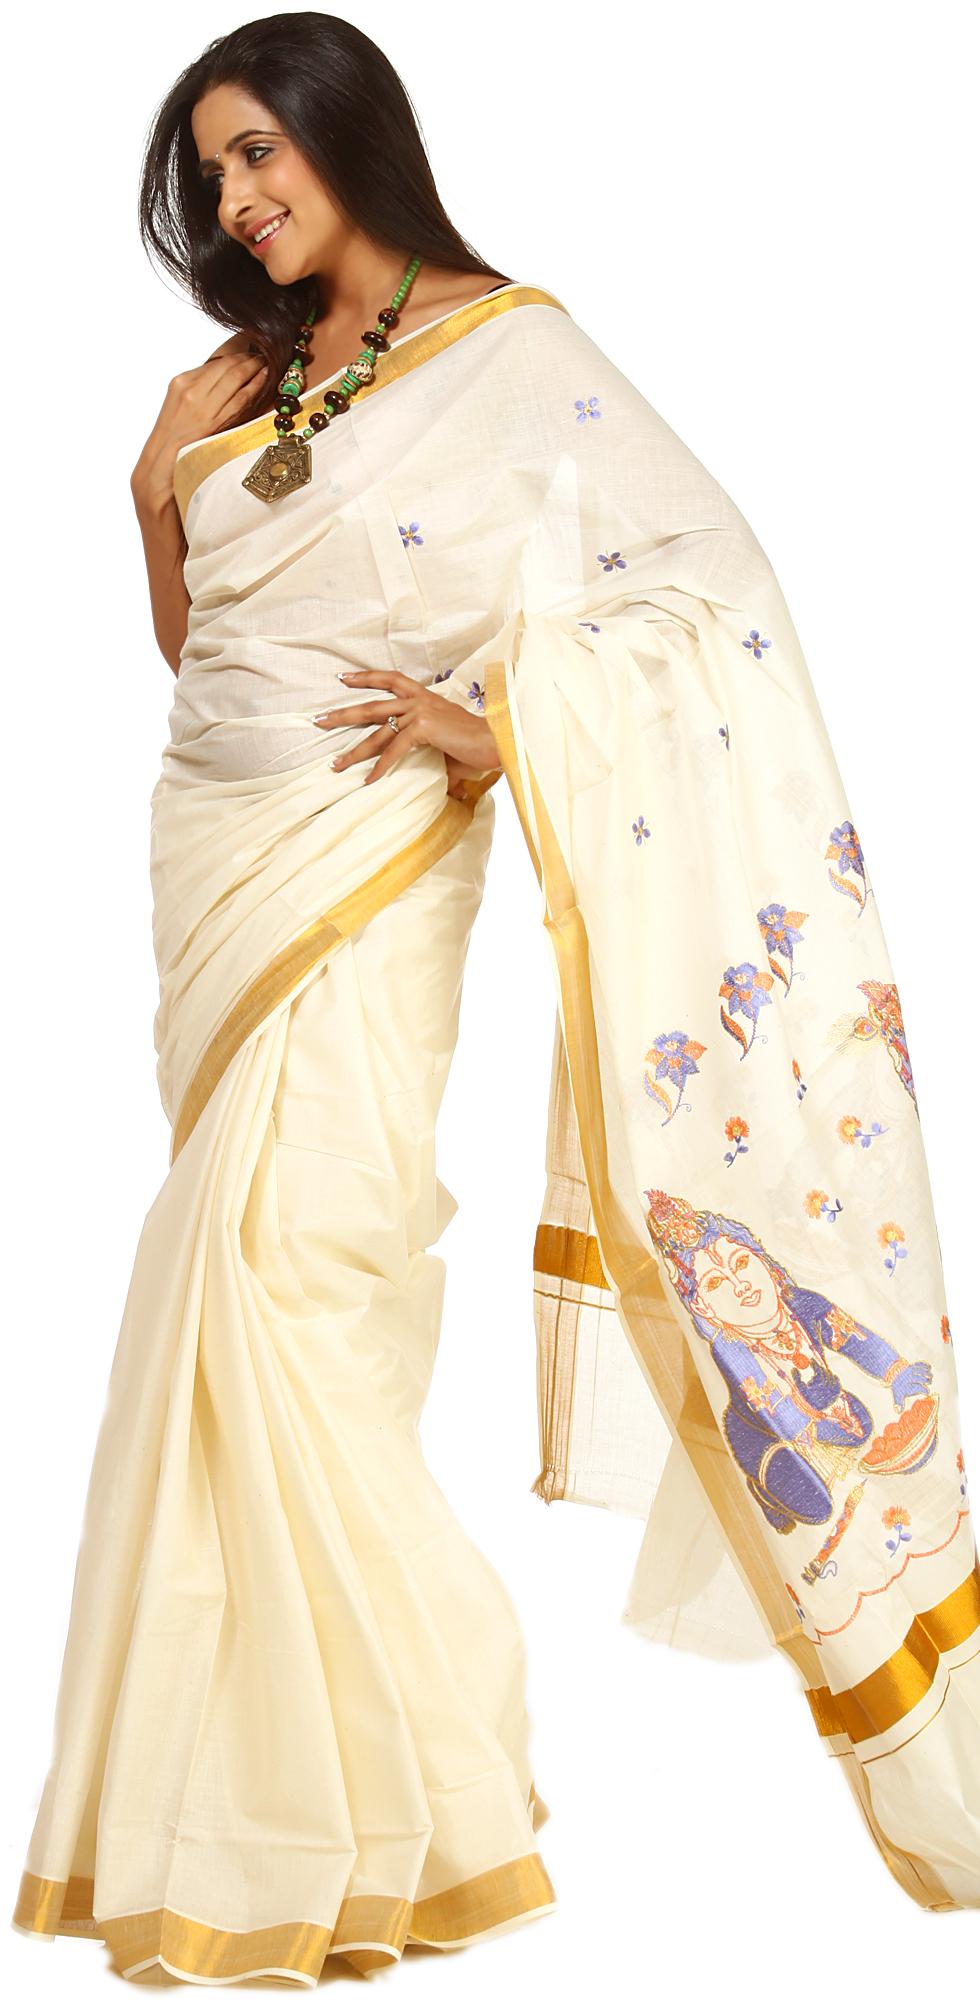 Ivory Kasavu Sari From Kerala With Embroidered Bal Krishna